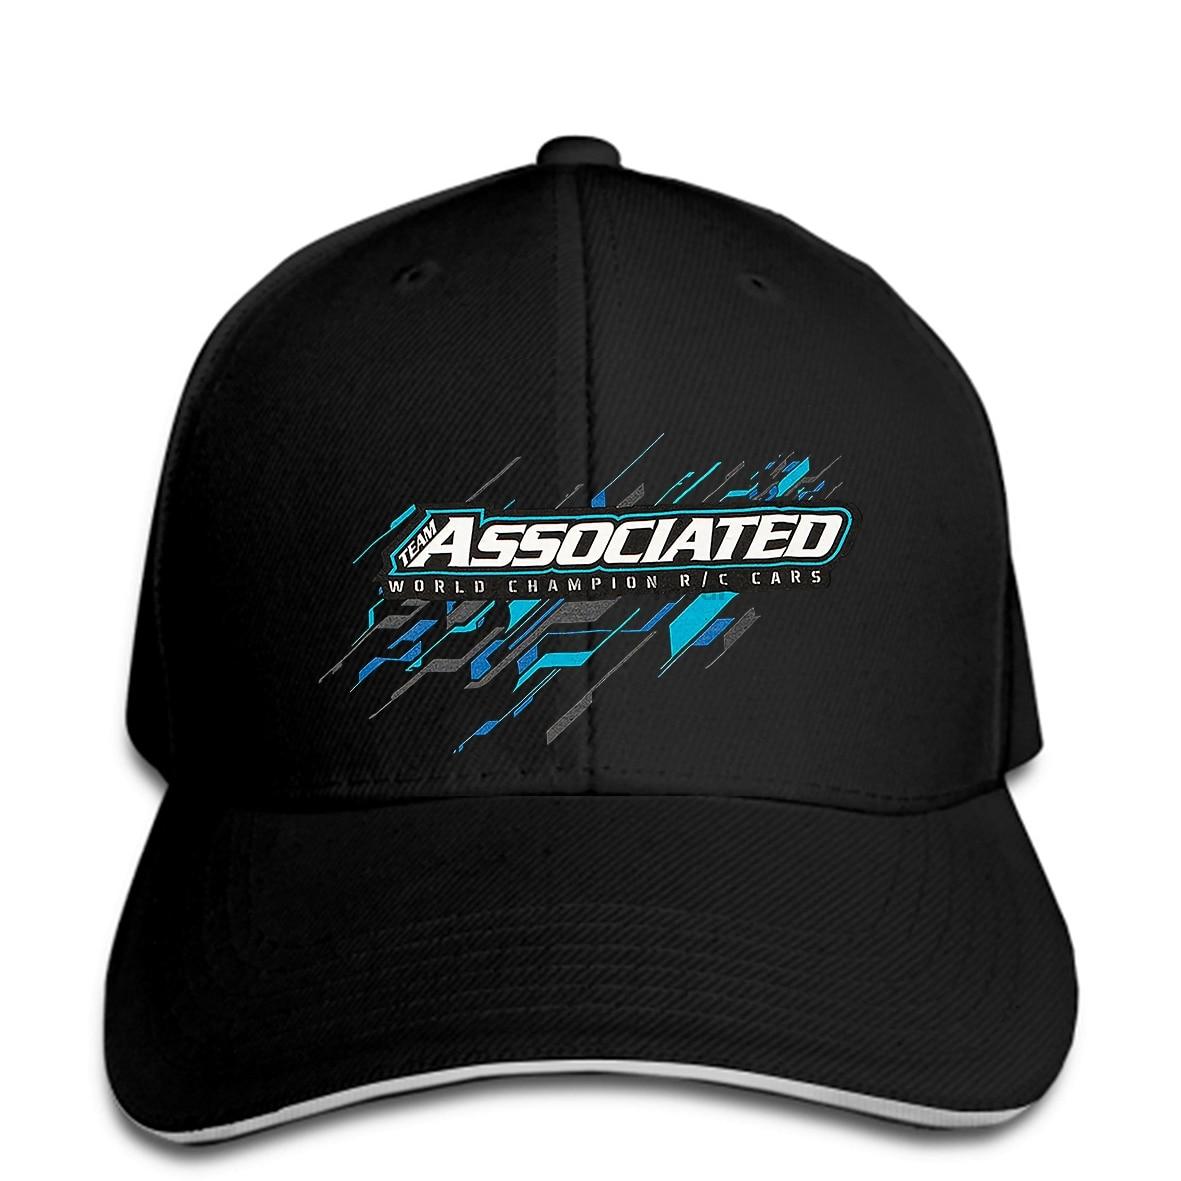 Baseball cap Team Associated Ae 2017 Worlds (Baseball caps) Black (Xx) SP124XX